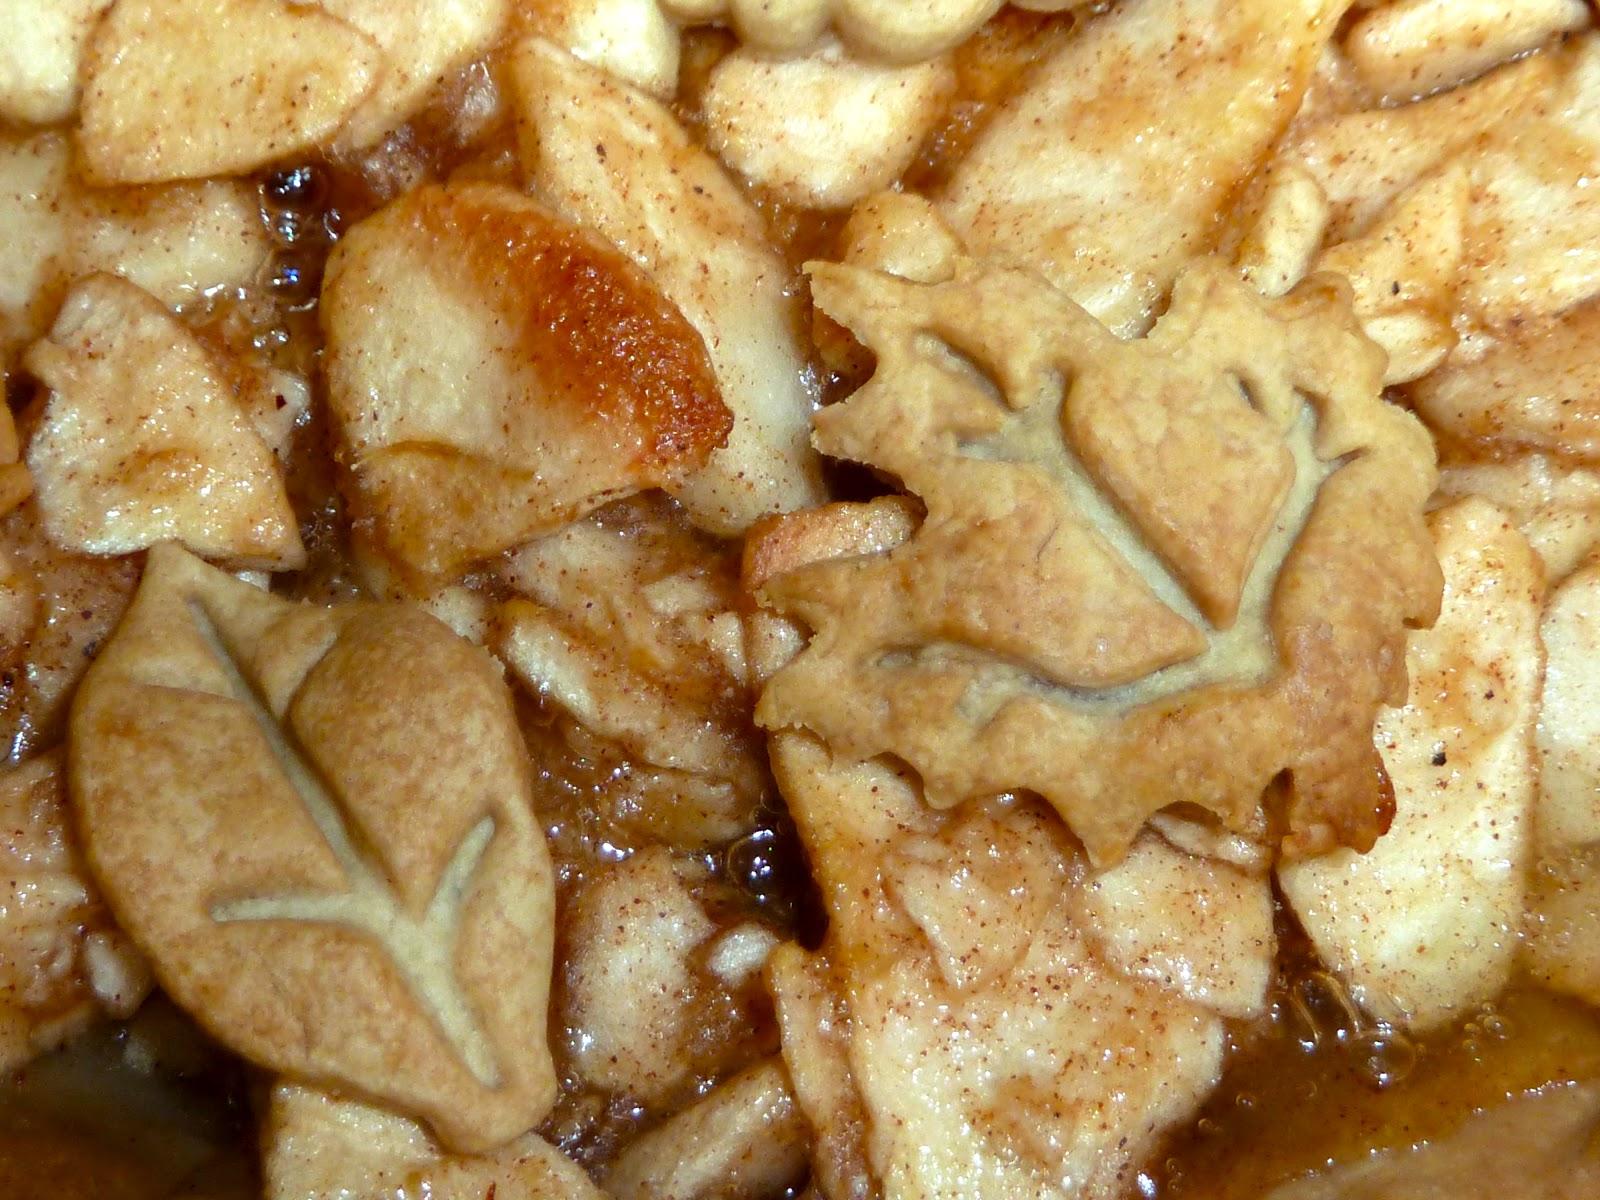 Gluten Free Baking Bear: GLUTEN FREE APPLE PIE WITH VEGAN DAIRY FREE ...